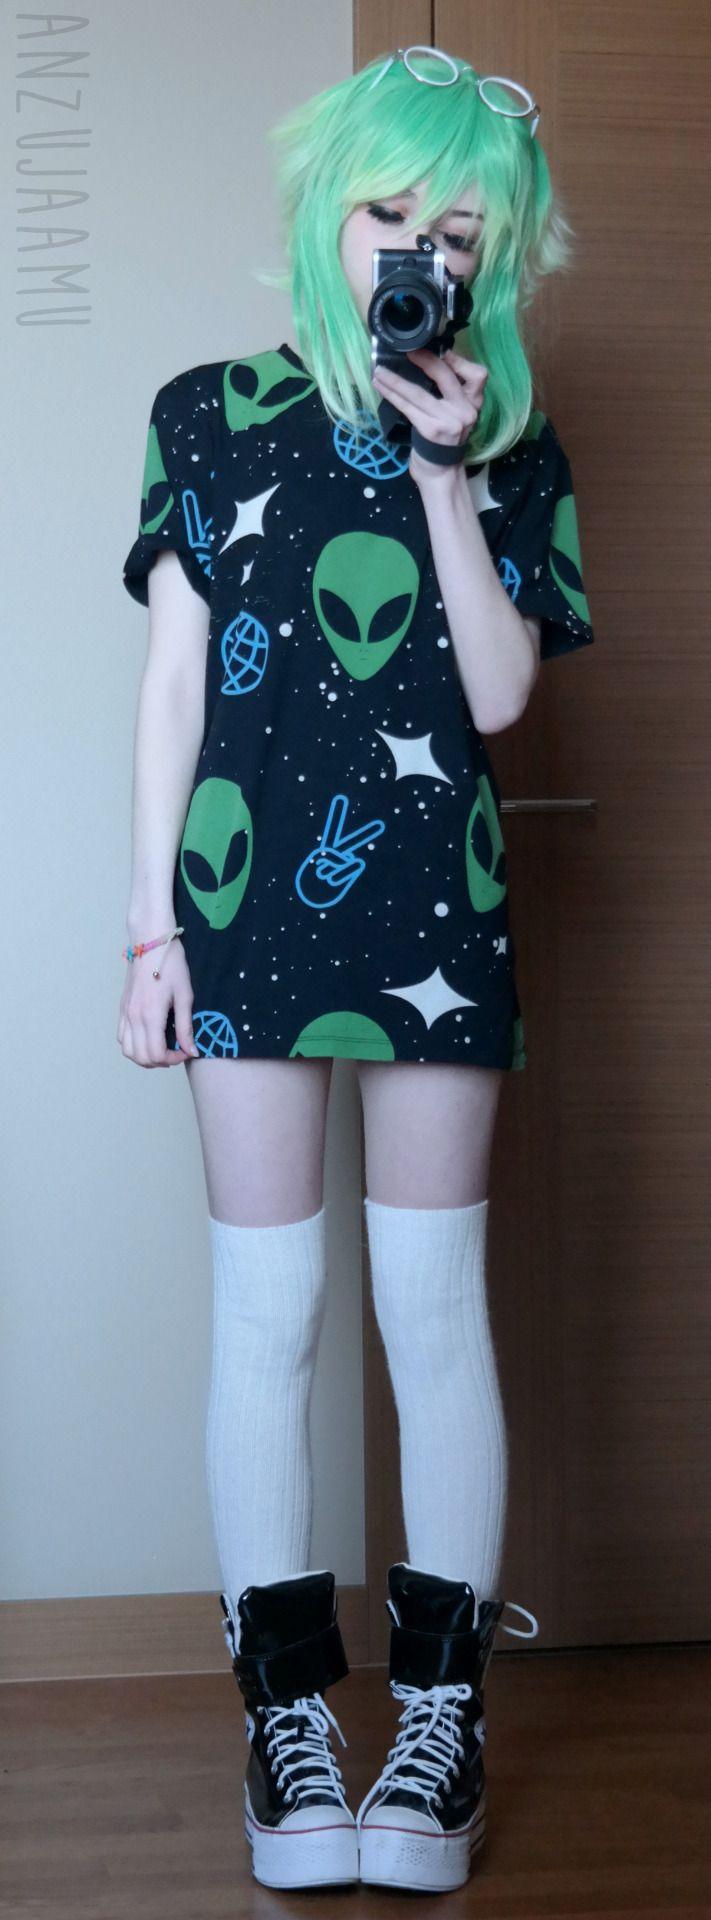 anzujaamu - Aaaaaliens! Vocaloid Gumi inspired. Outfit Rundown...